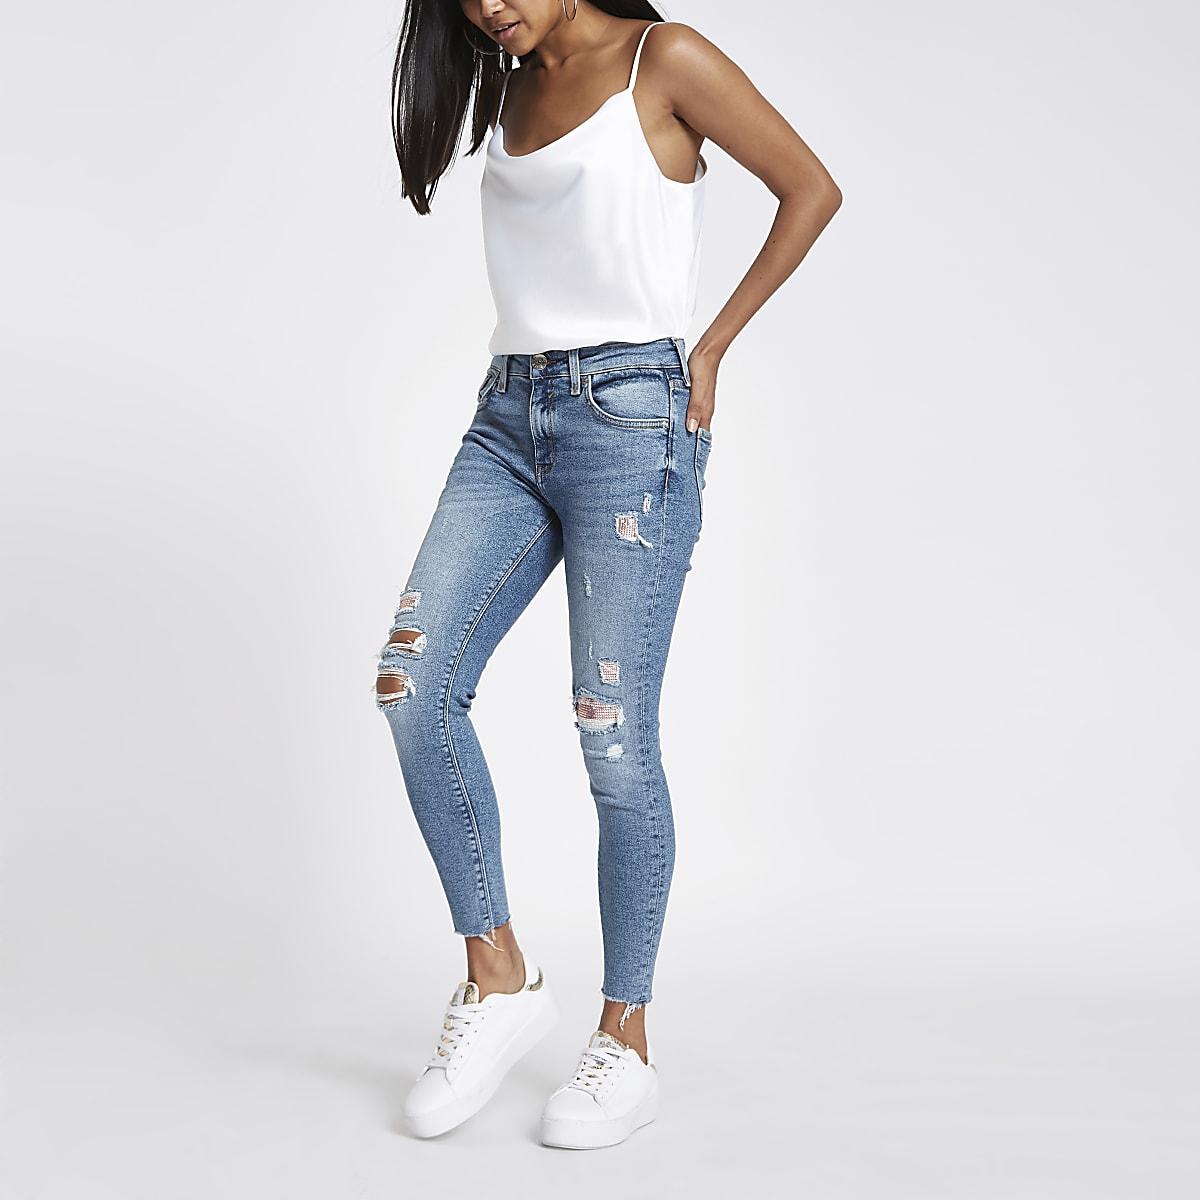 3f2fb14d05980e Petite – Amelie – Mittelblaue Jeans im Used Look - Skinny Jeans ...